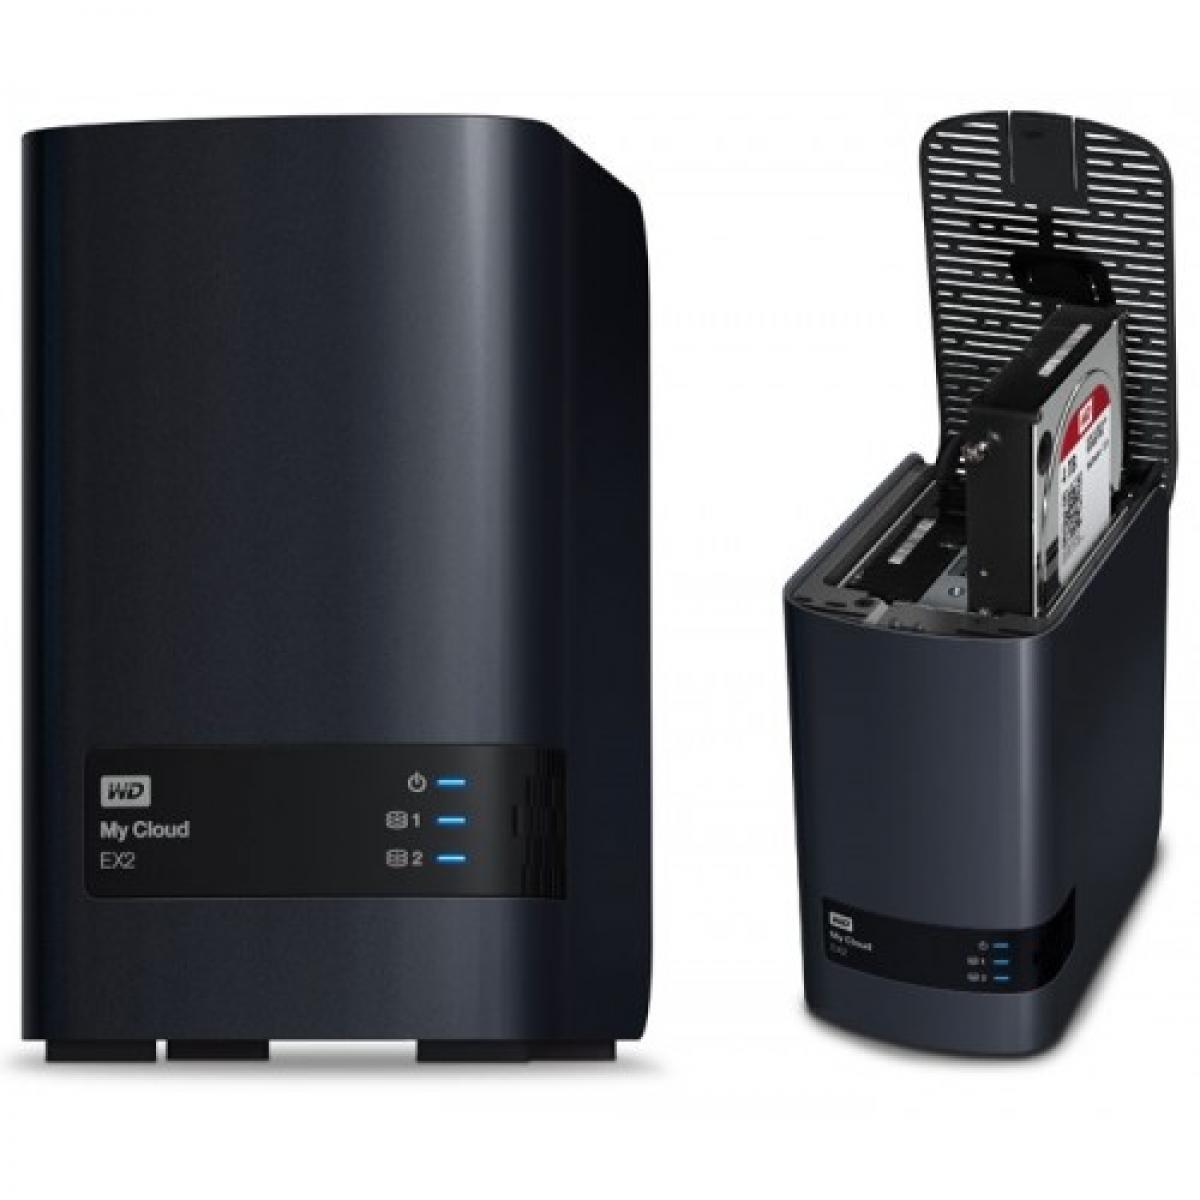 WD 8TB My Cloud EX2 Ultra 2-Bay Cloud Storage Server